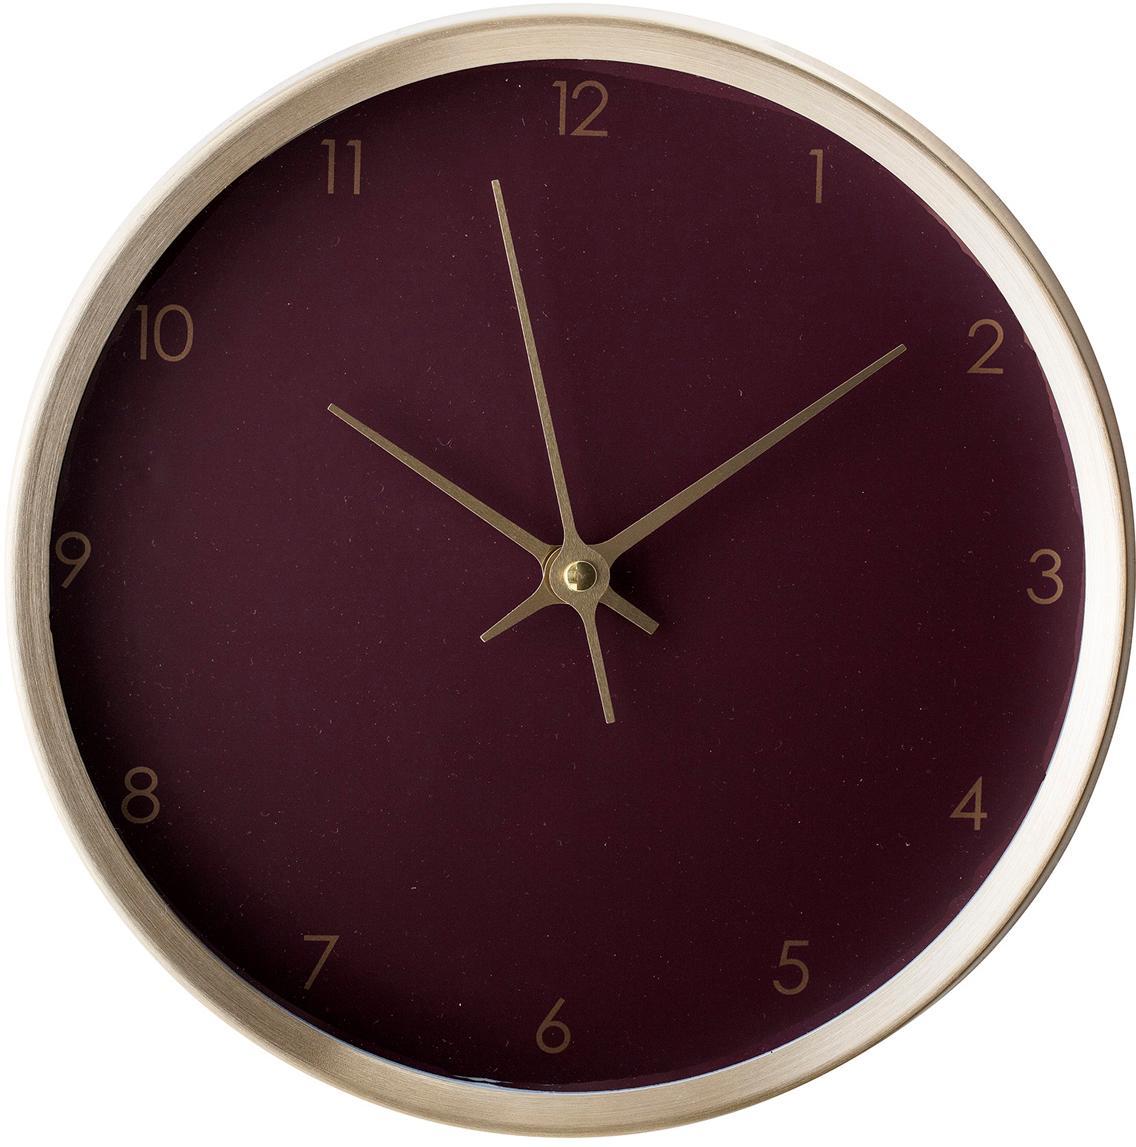 Reloj de pared Ola, Agujas: aluminio, pintado, Rojo burdeos, dorado, Ø 25 x P 5 cm